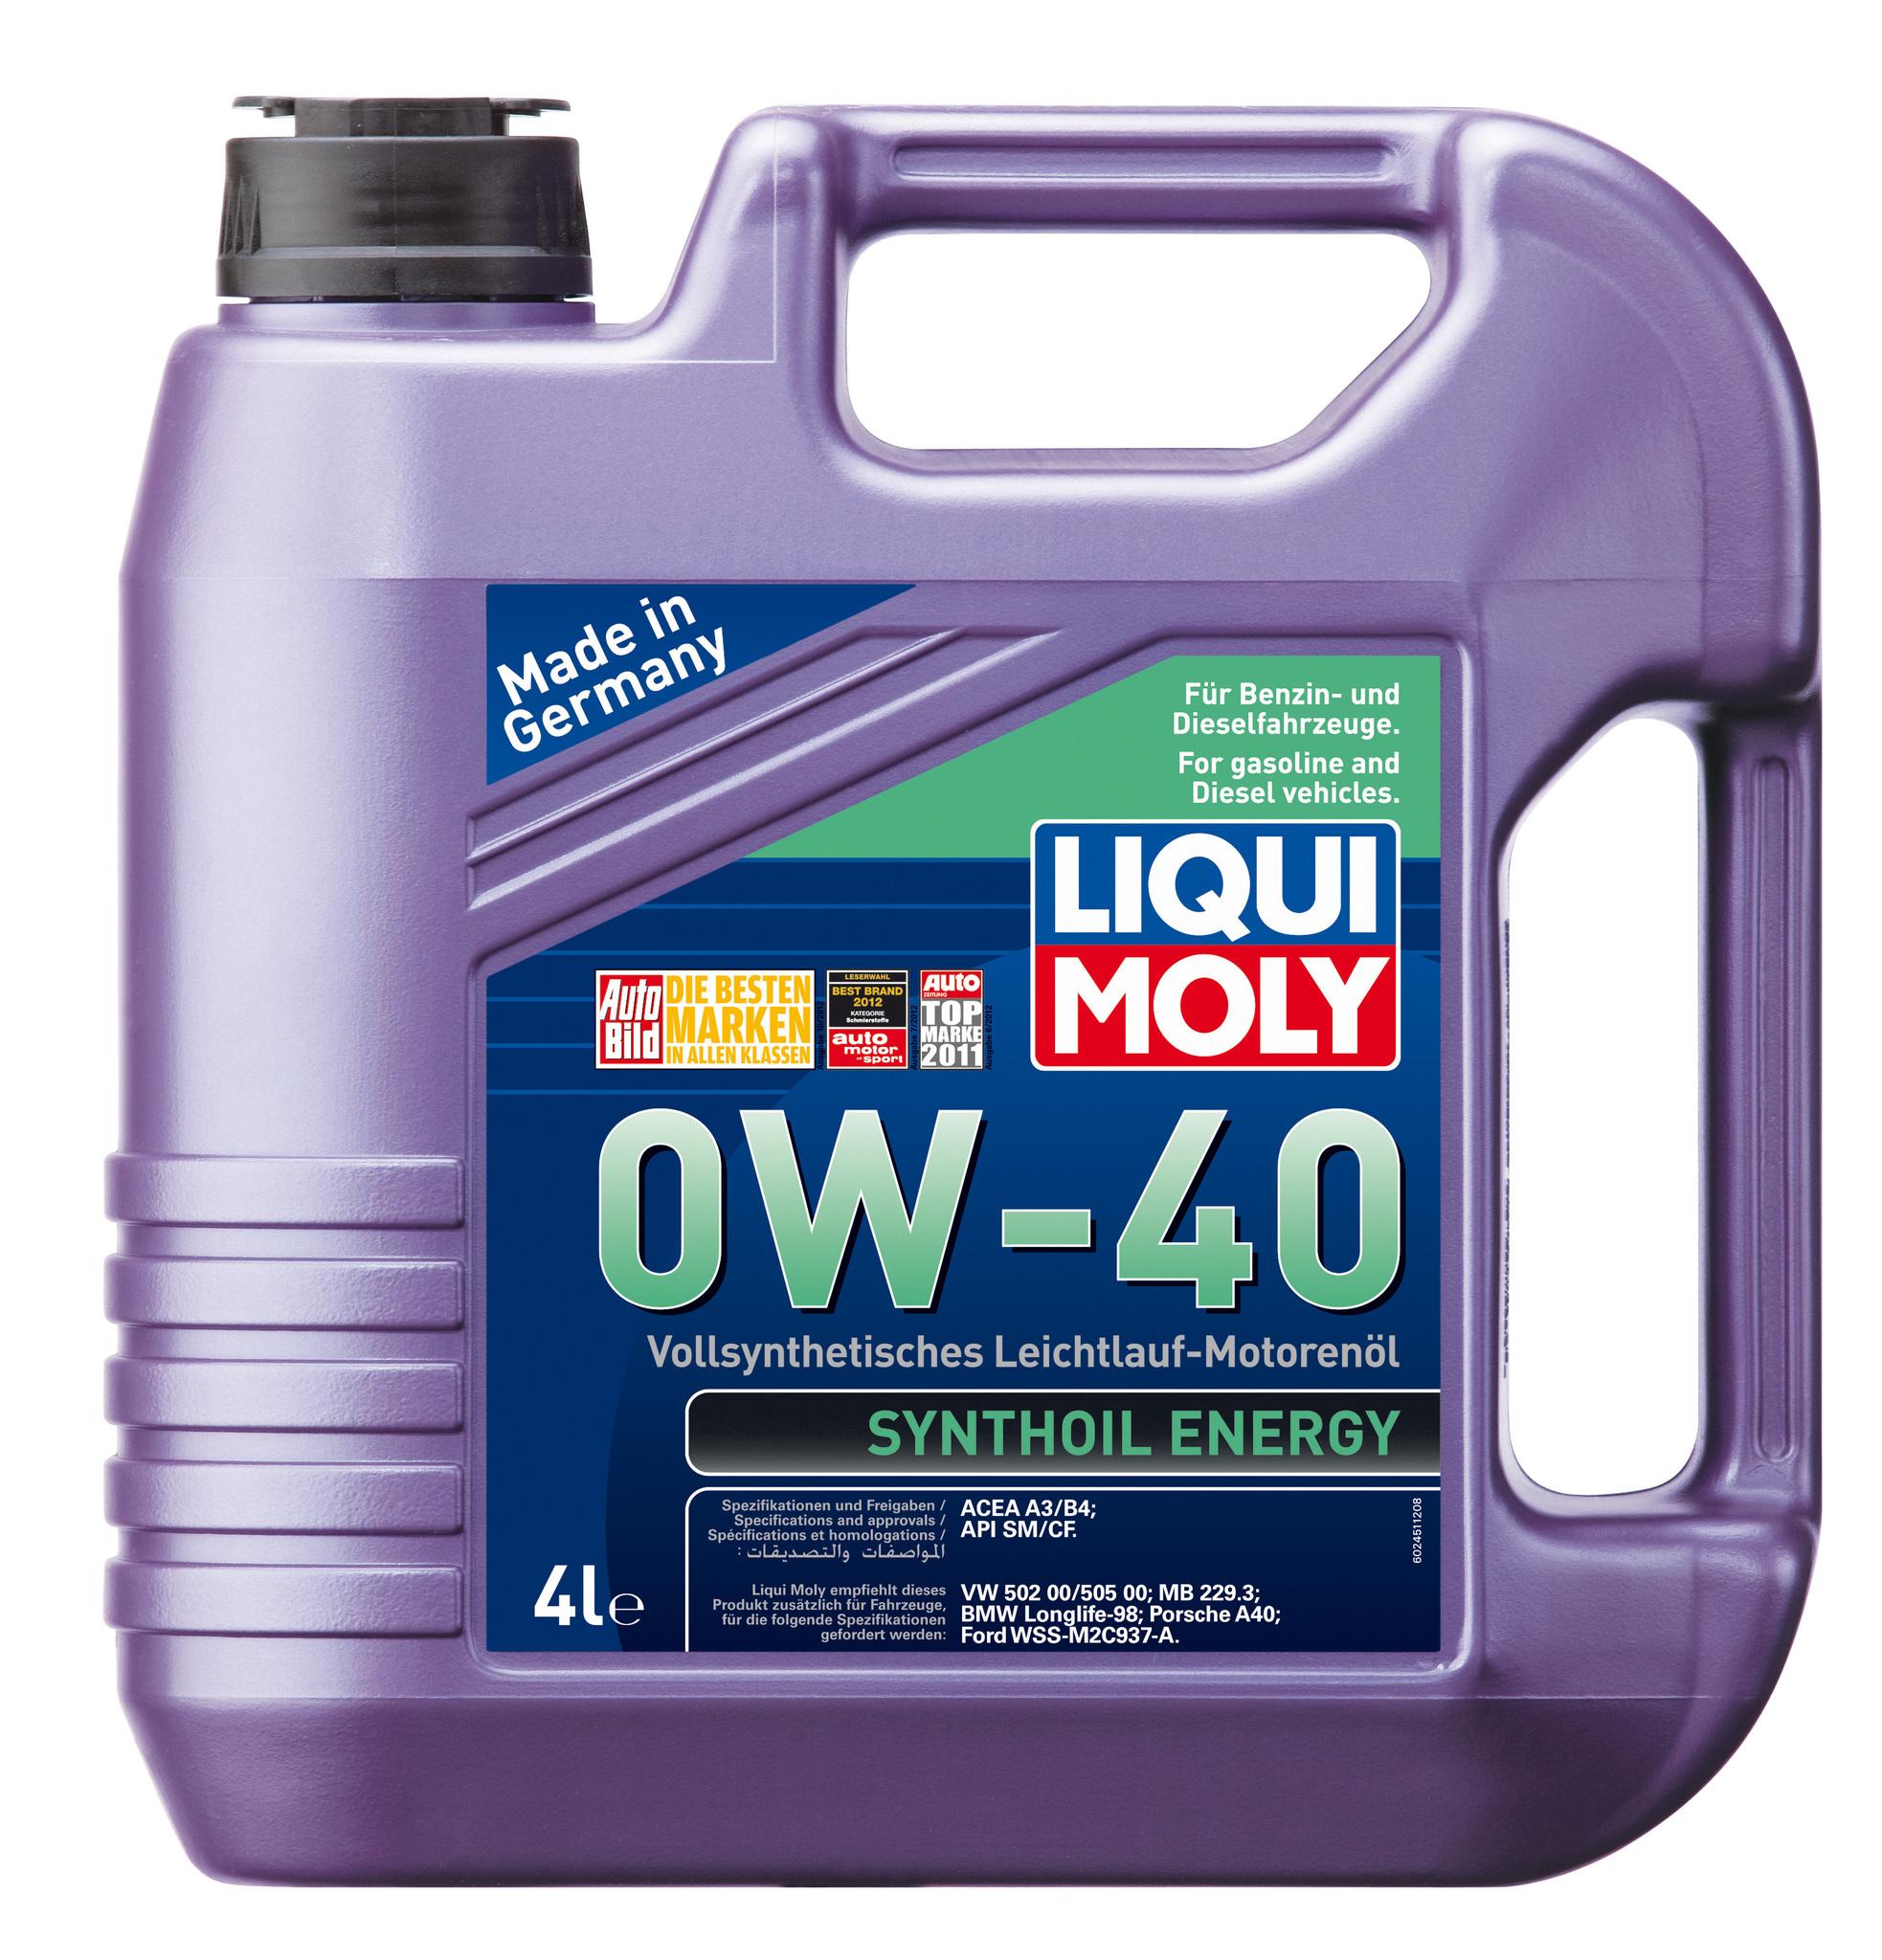 Liqui Moly Synthoil Energy 0W40 Синтетическое моторное масло (7536)